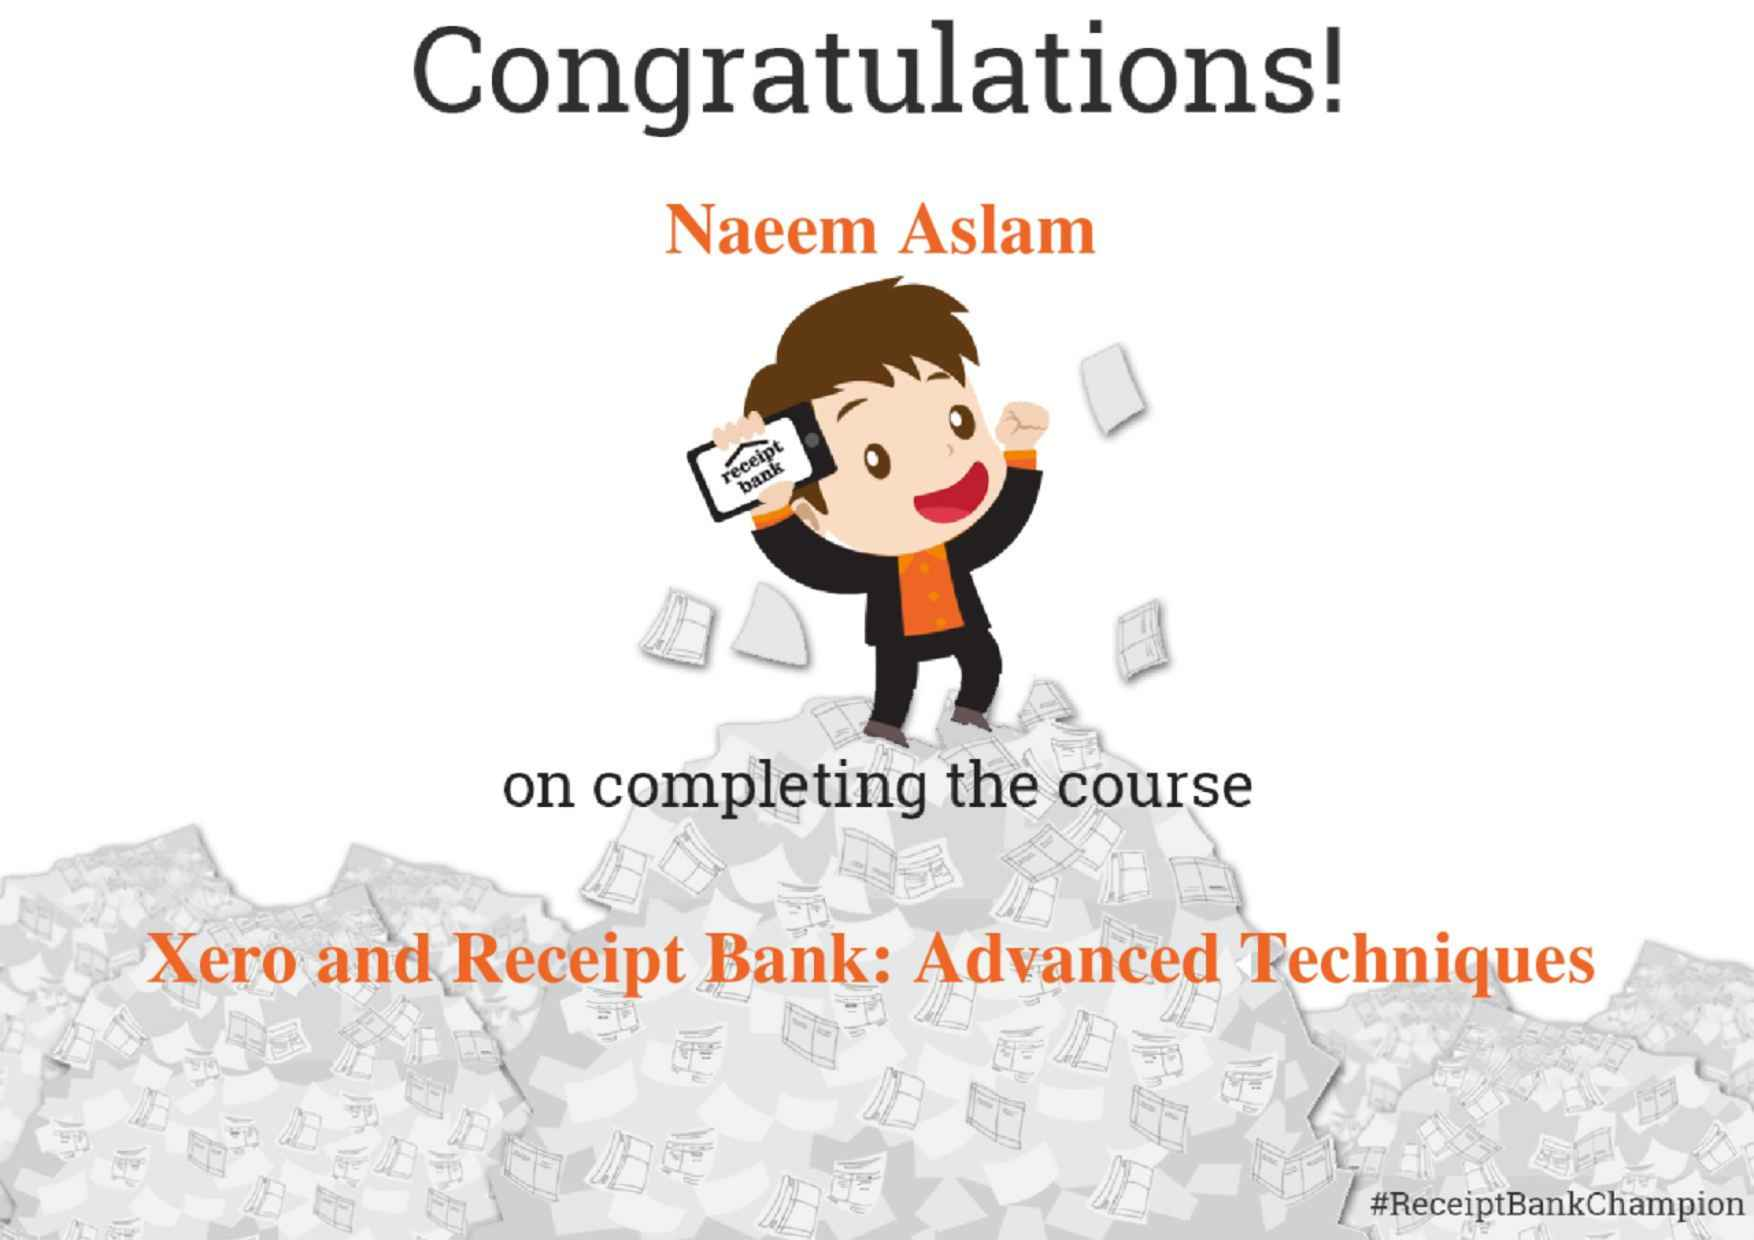 Naeem Aslam Bayt